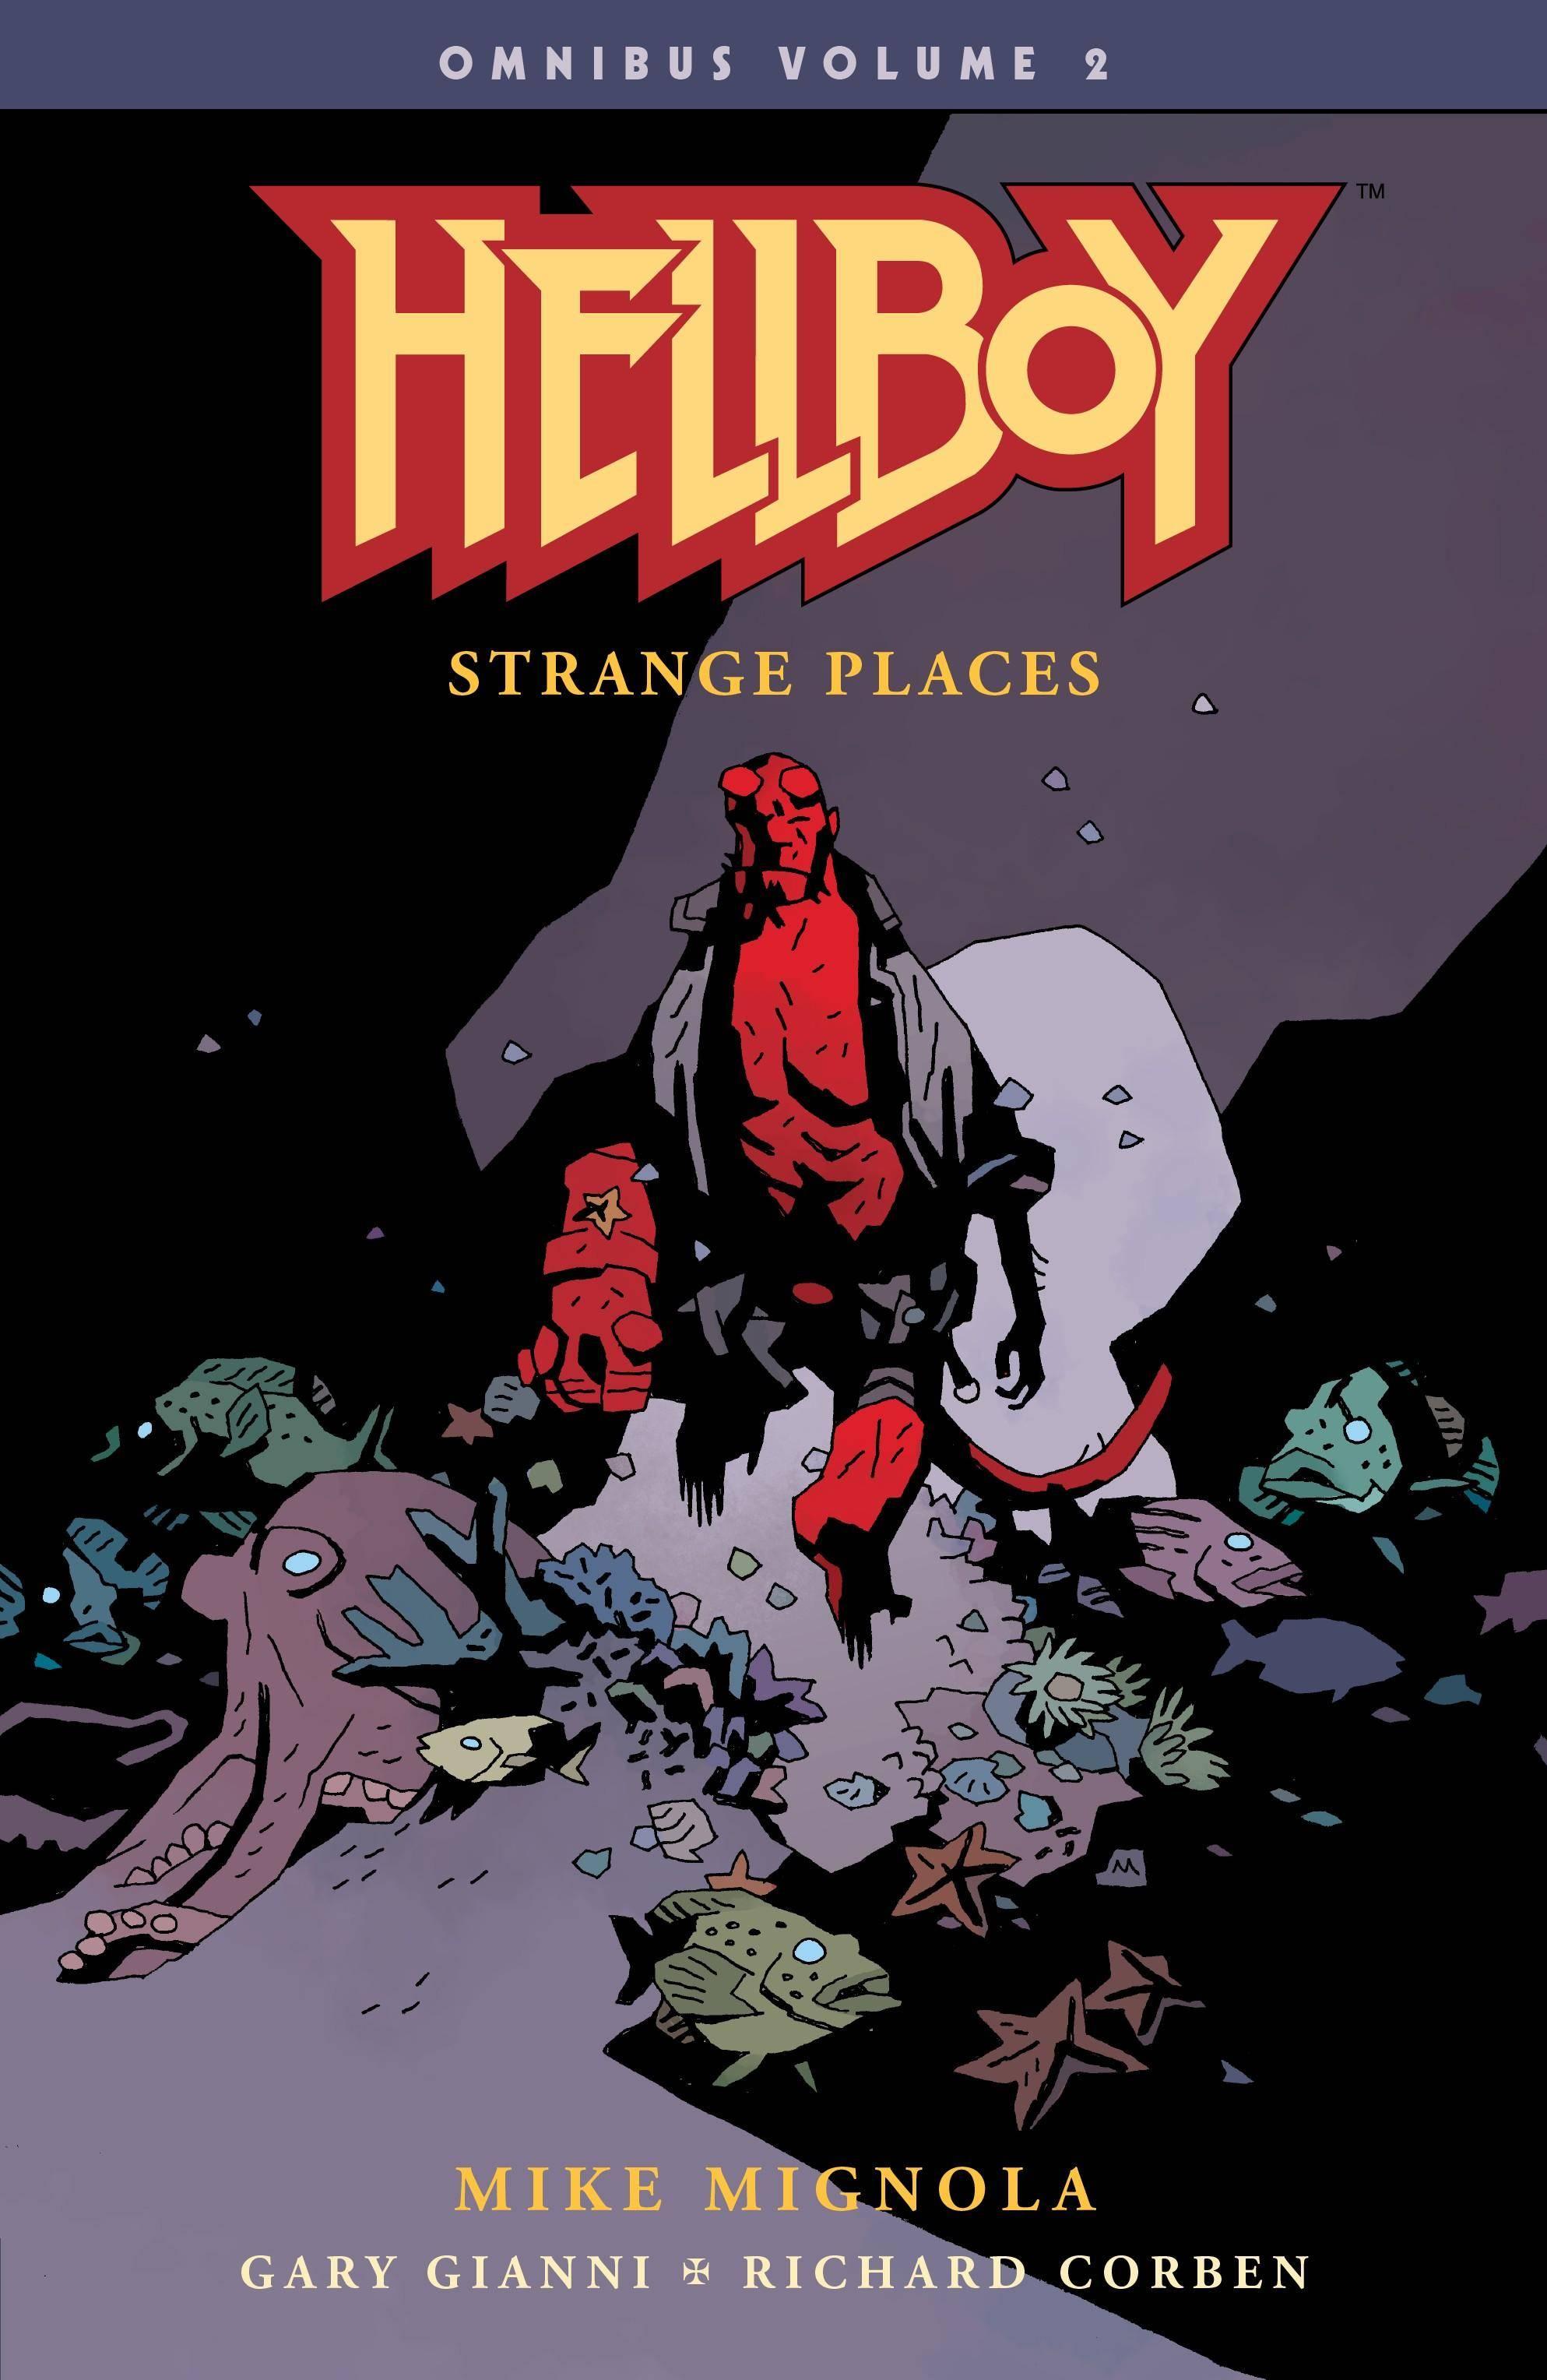 Hellboy.Omnibus.v02-Strange.Places.2018.digital.Son.of.Ultron-Empire